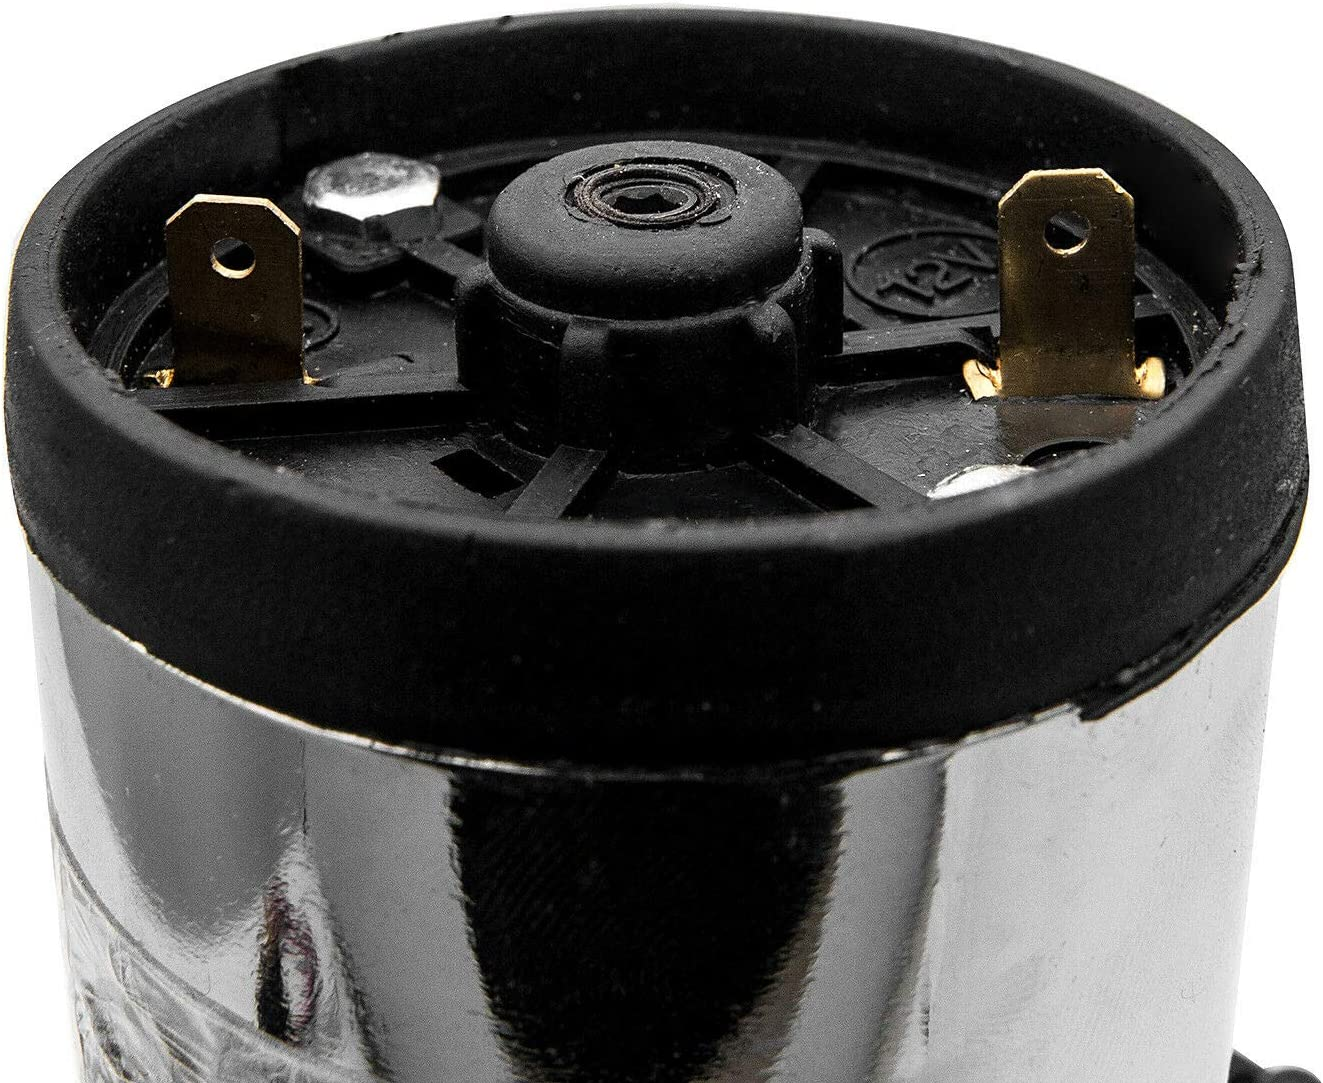 Car Antique Chrome Old Style Horn ,Classic Vintage Metal Loudspeaker Siren,Ahooga OOGA VXH1002C Bessie Sparks Bugle Horn